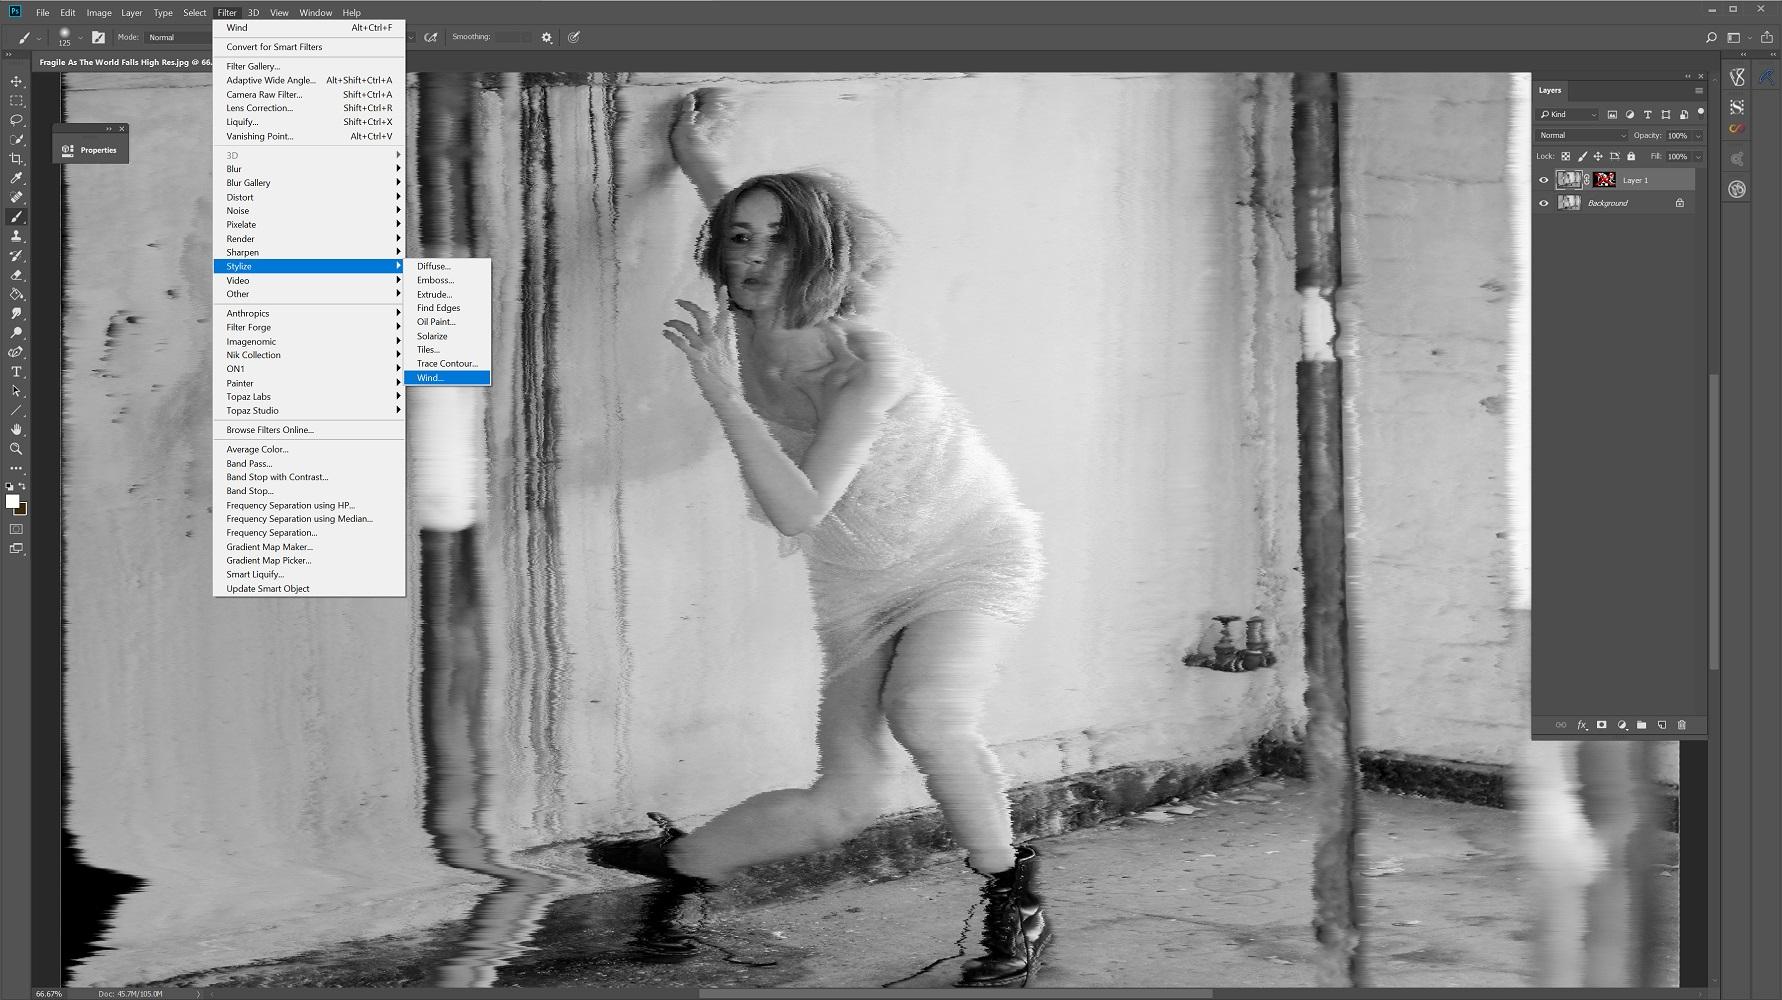 CJM Weekly Photoshop Tip #18: Glitch Effect